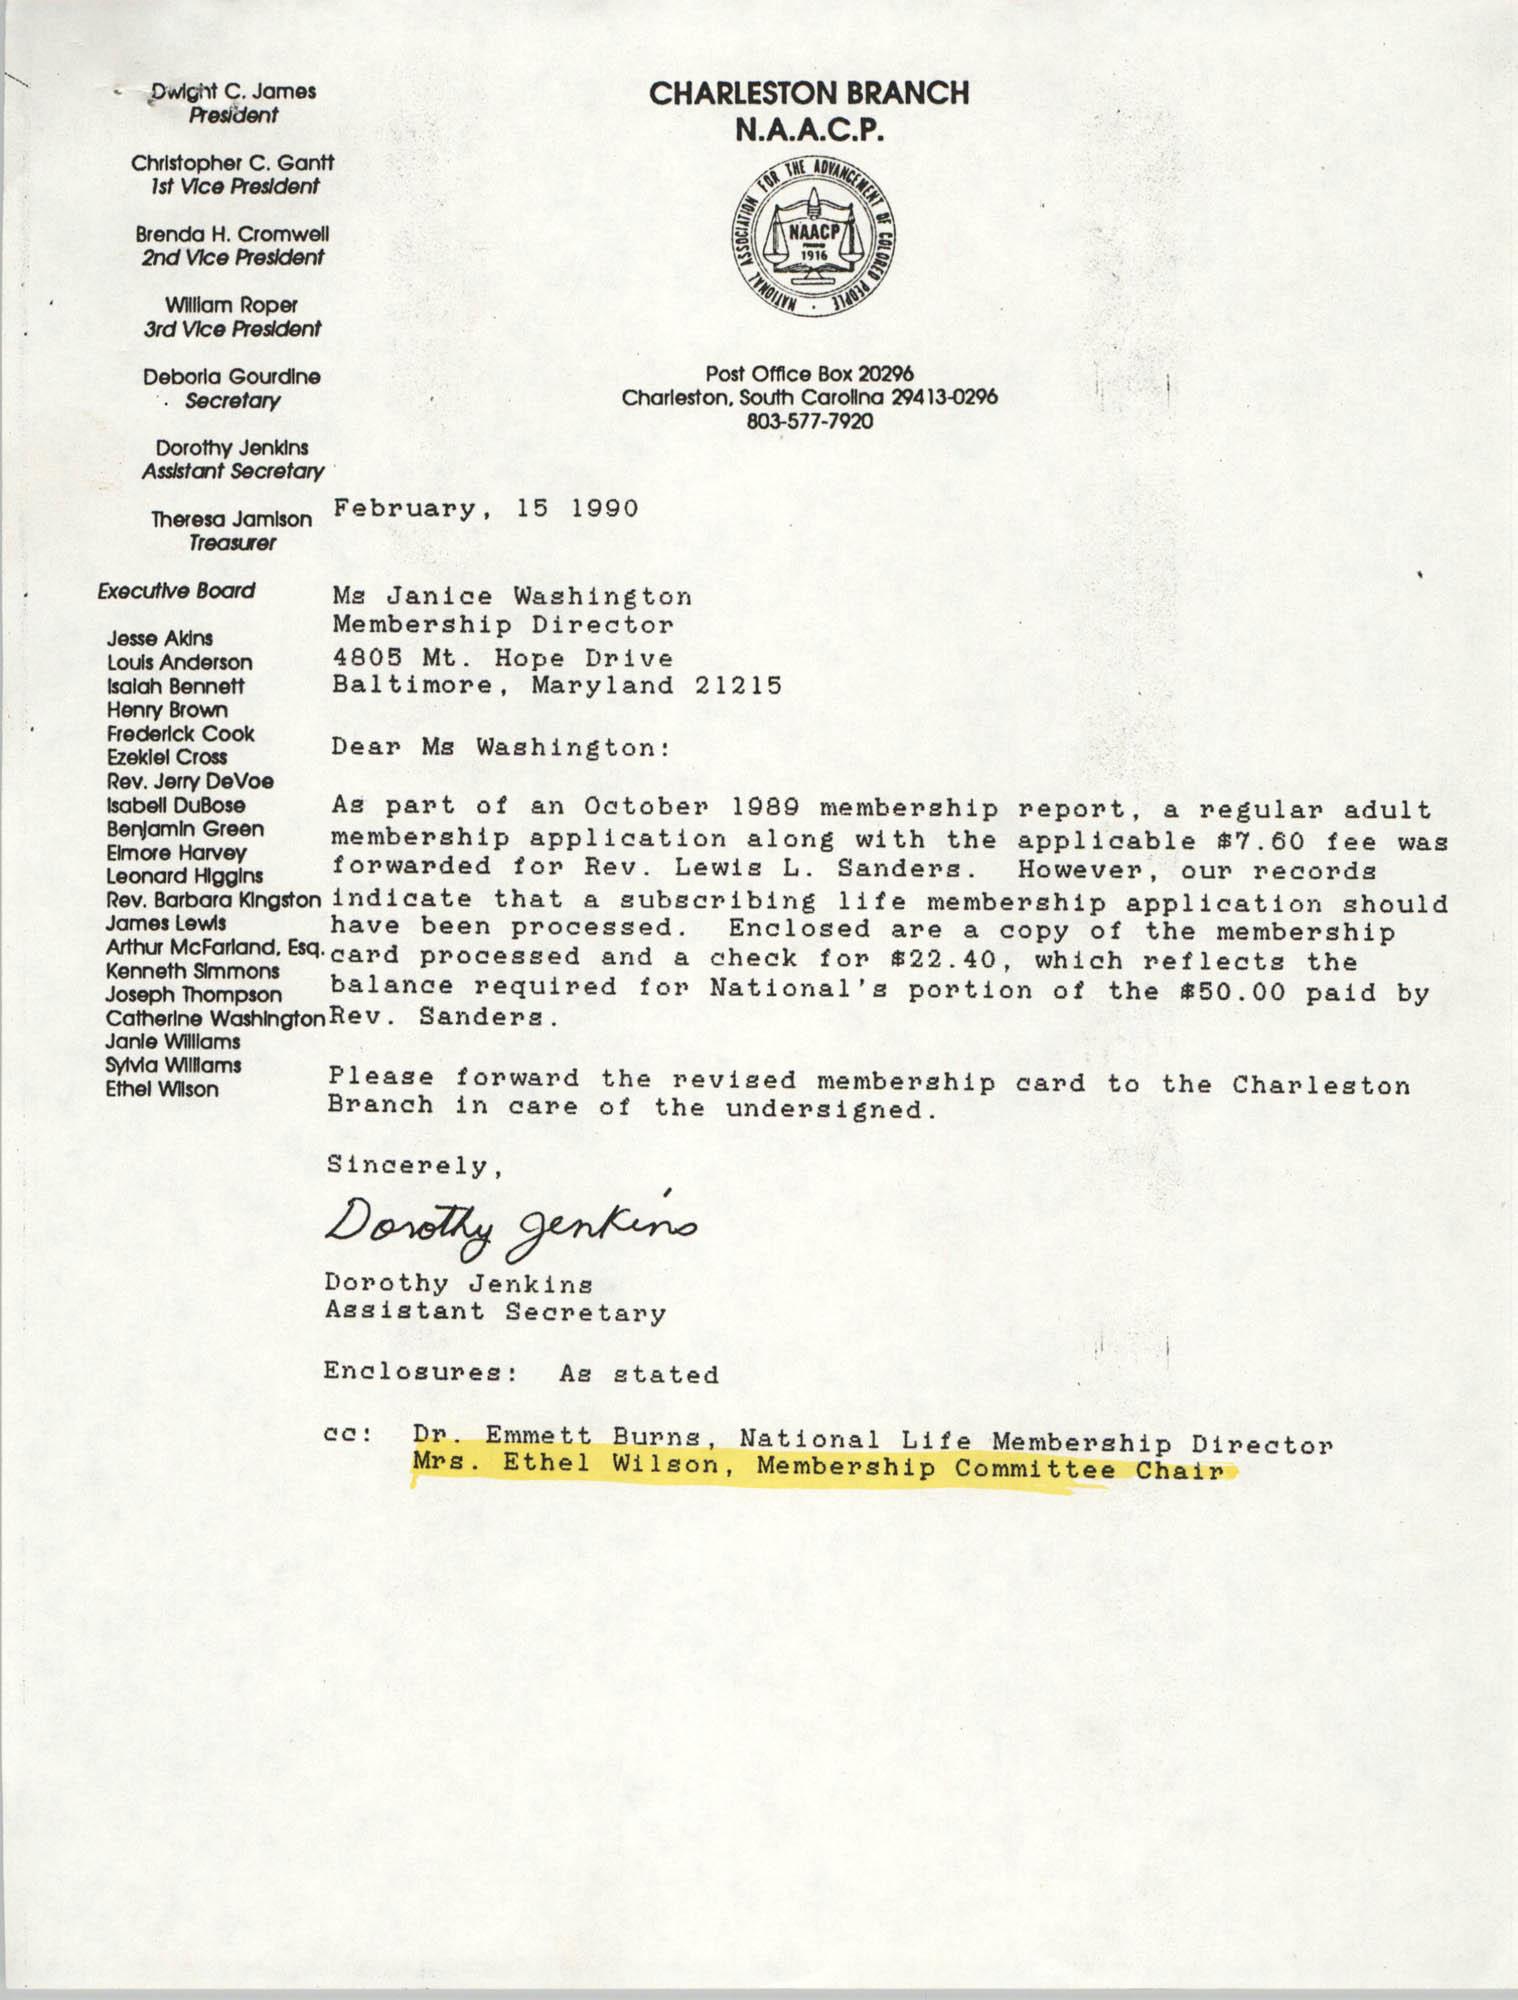 Letter from Dorothy Jenkins to Janice Washington, NAACP, February 15, 1990